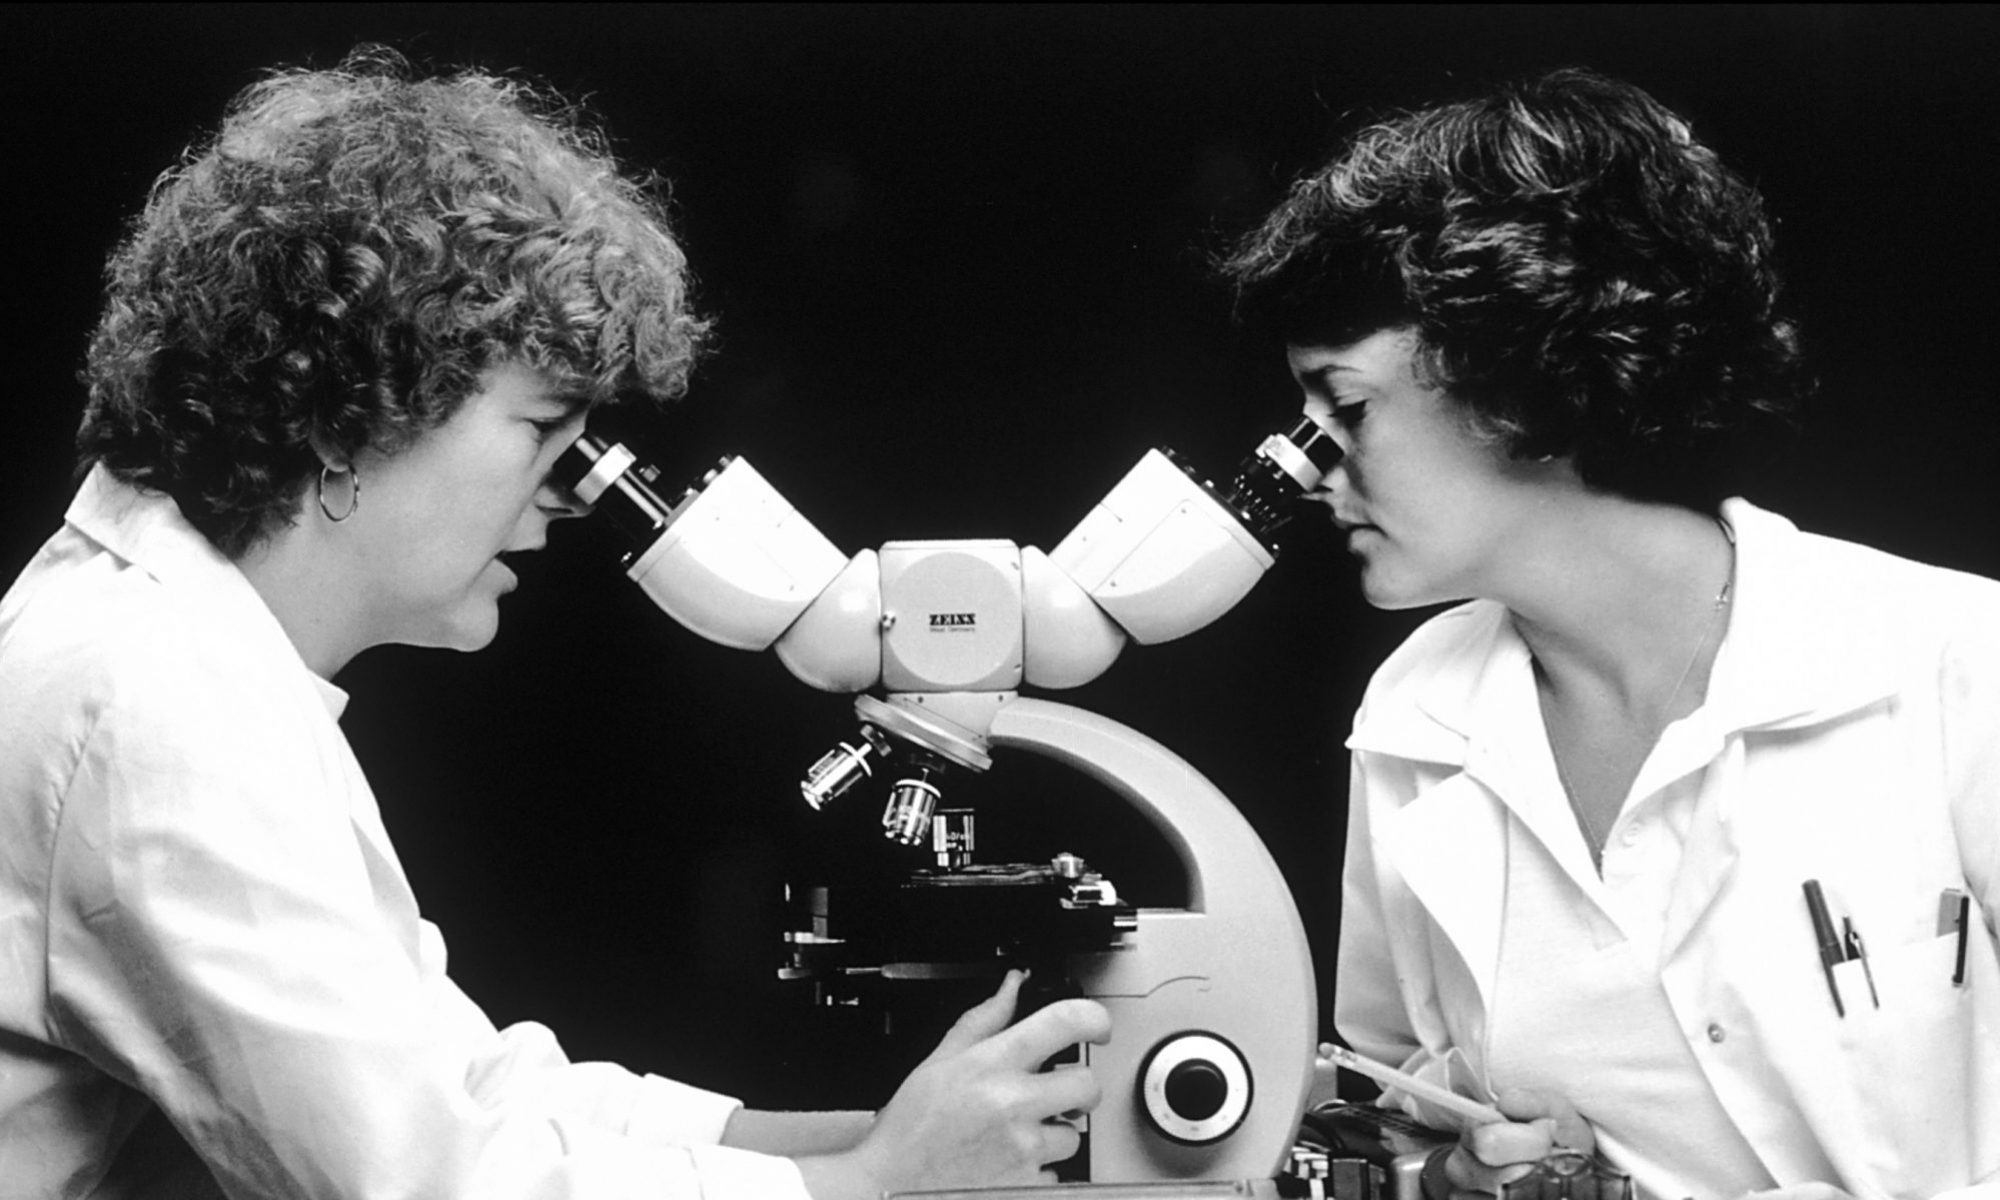 Collaborating for gender equality in STEM